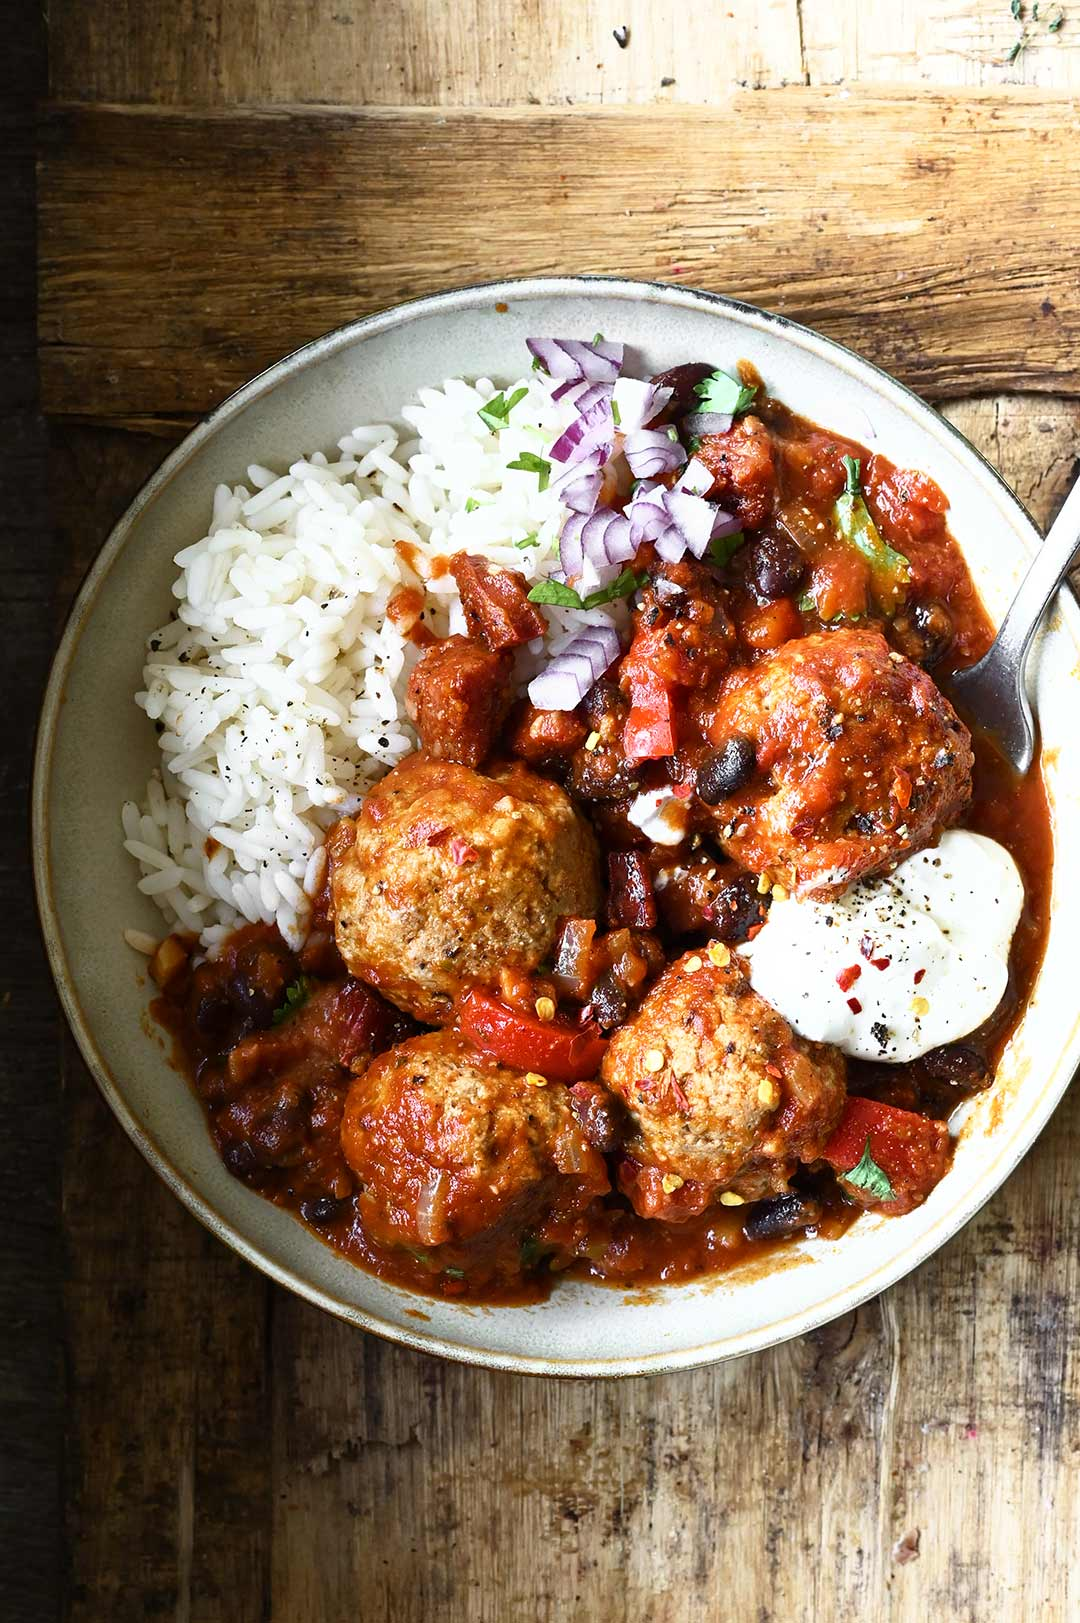 meatballs in smoky tomato sauce